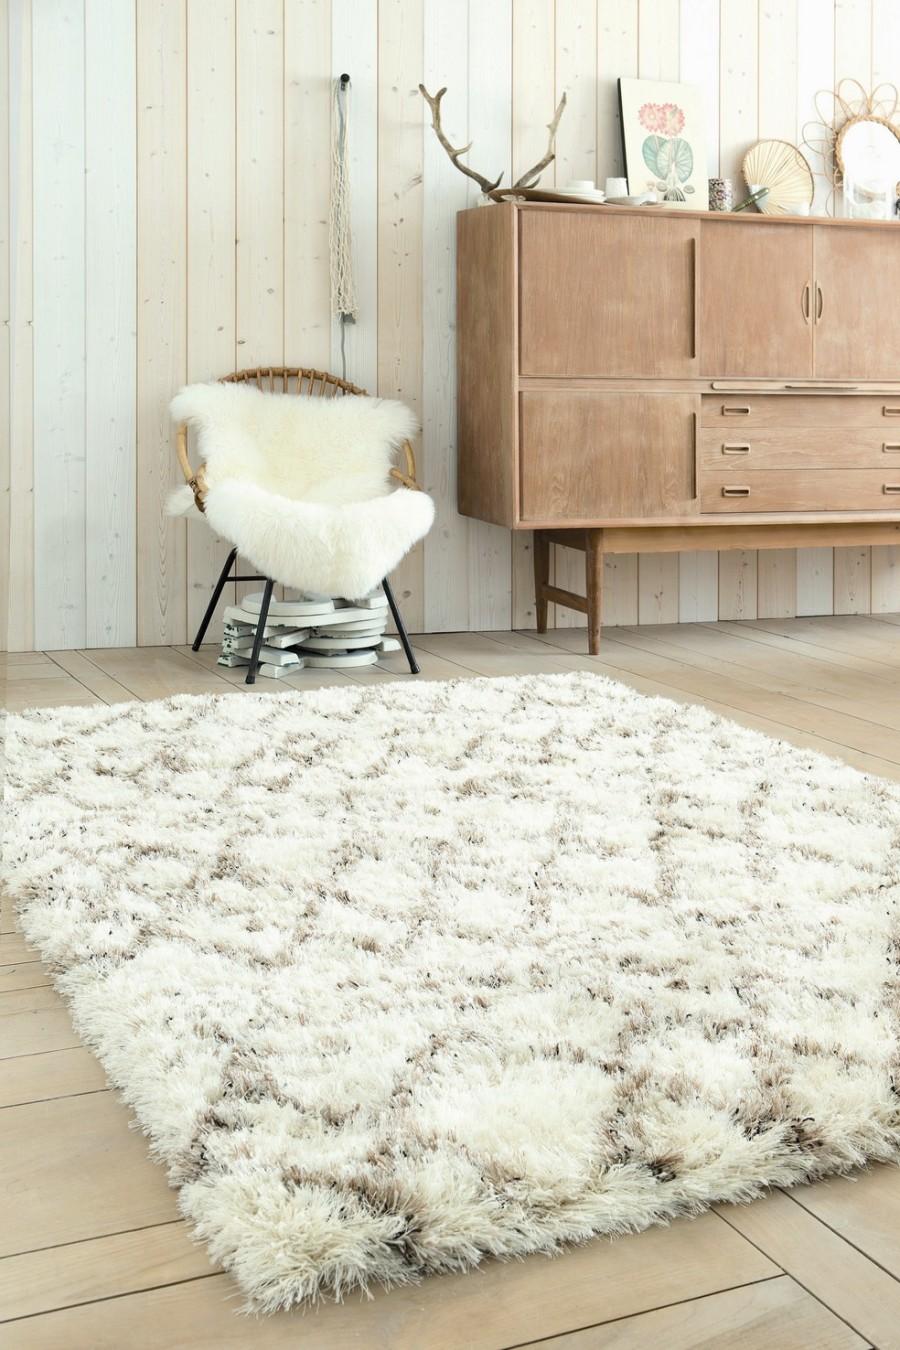 Alfombra de lana -Villalba Interiorismo